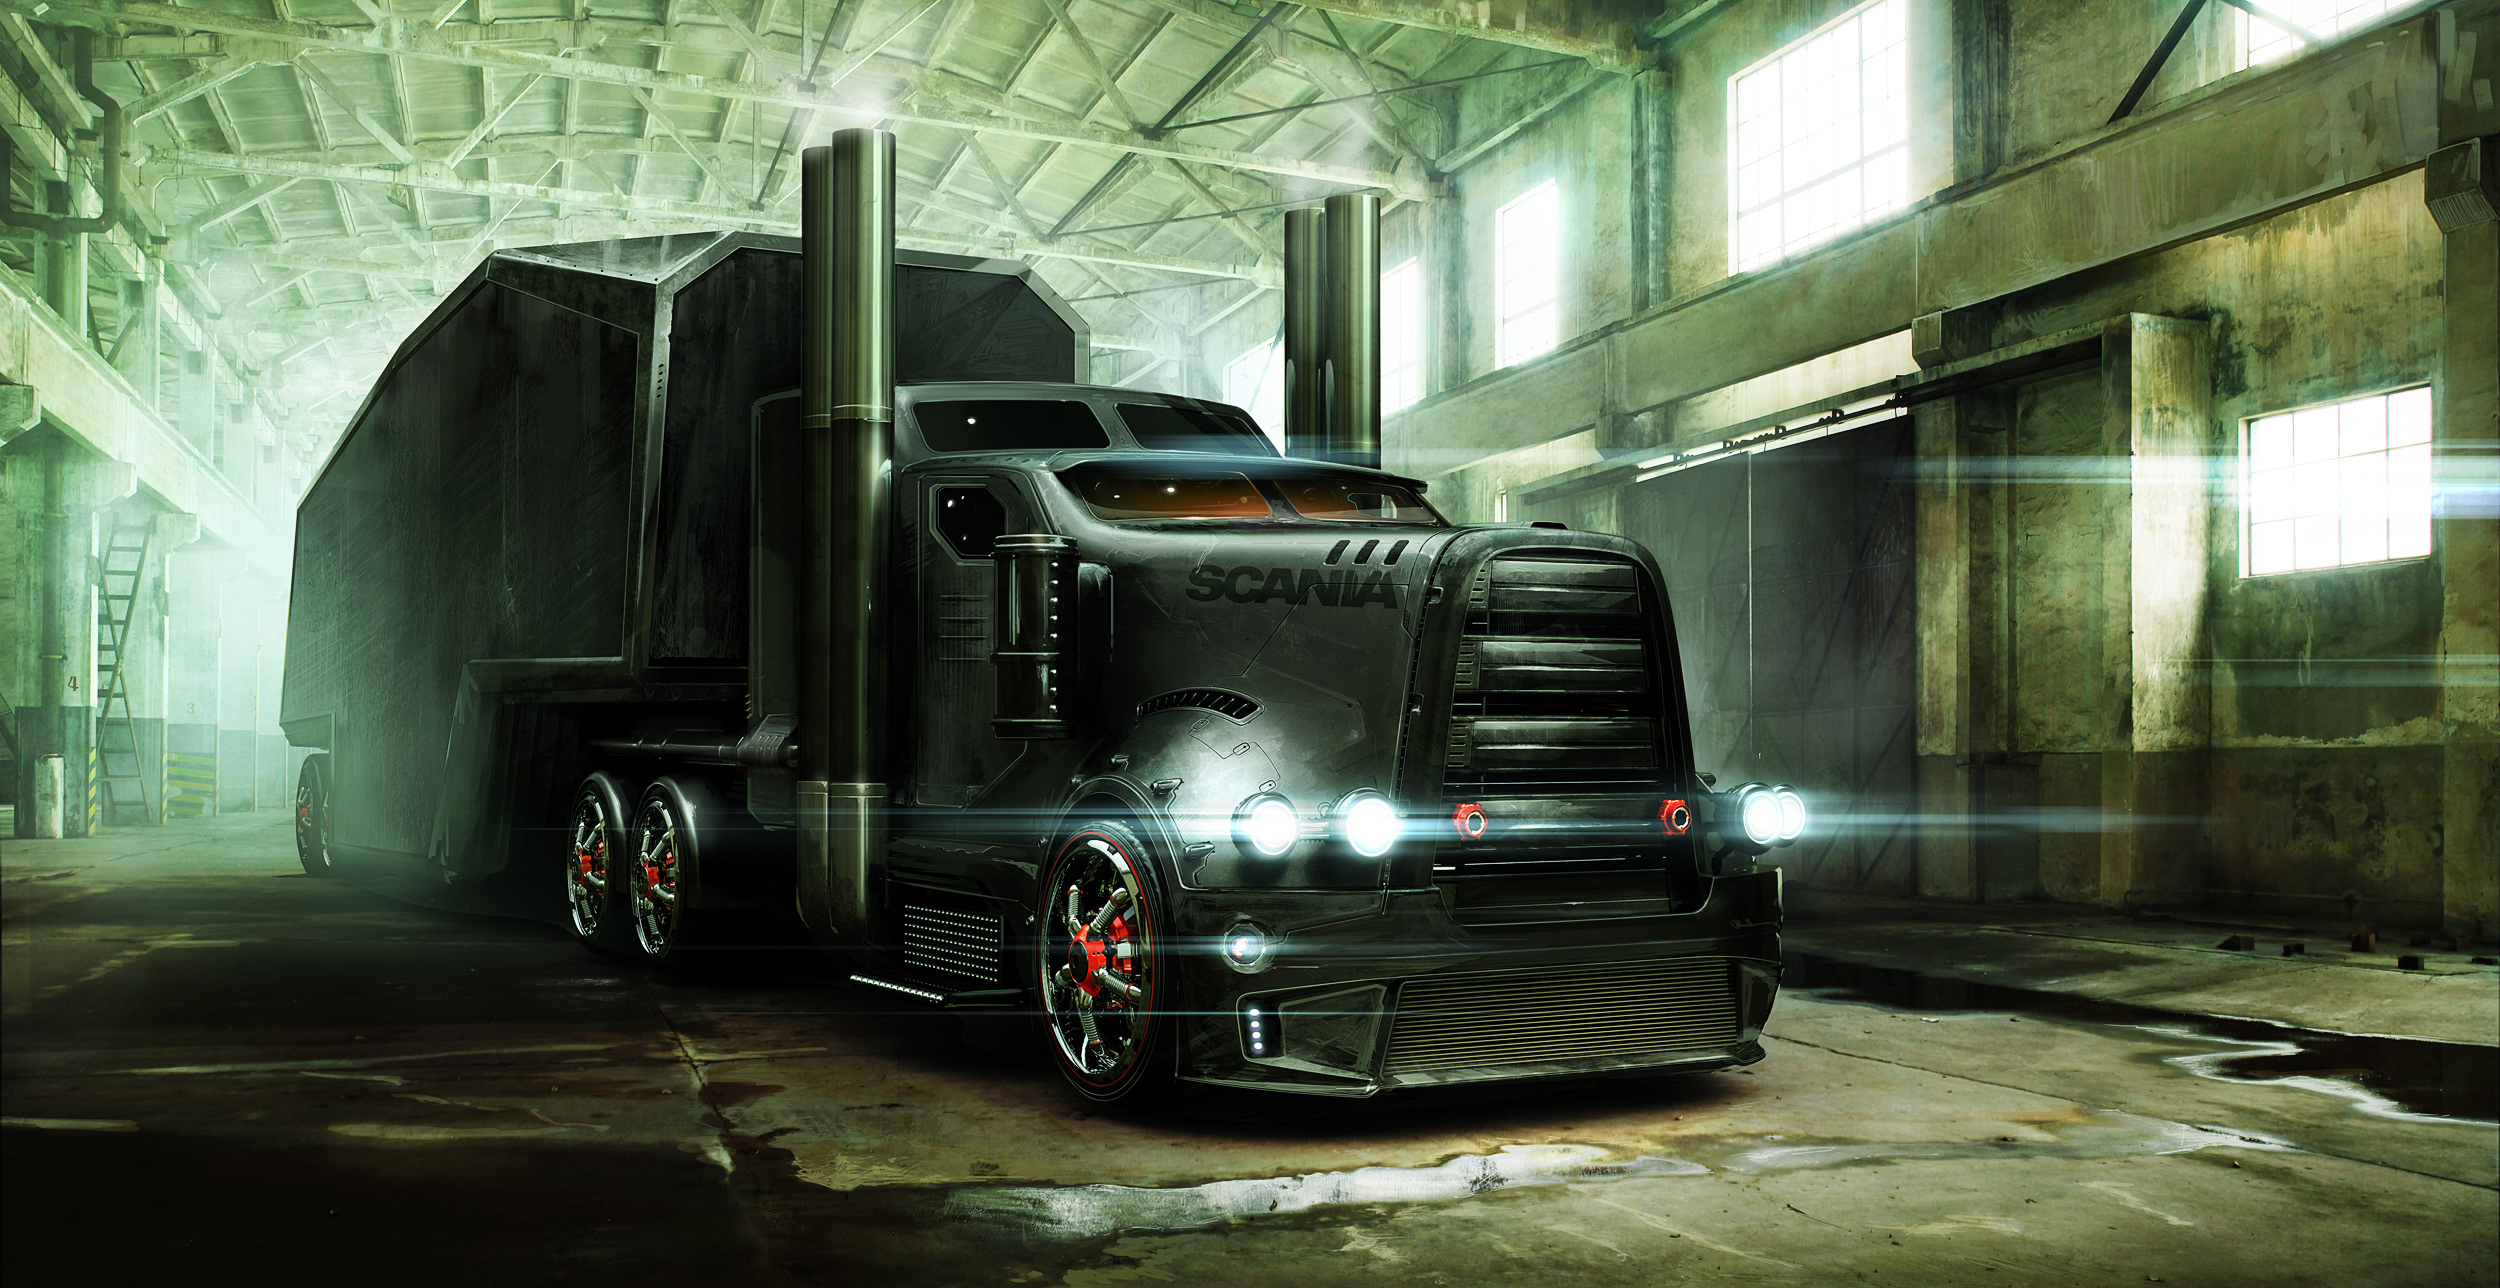 trucks scania cars sci fi semi tractor tuning wallpaper